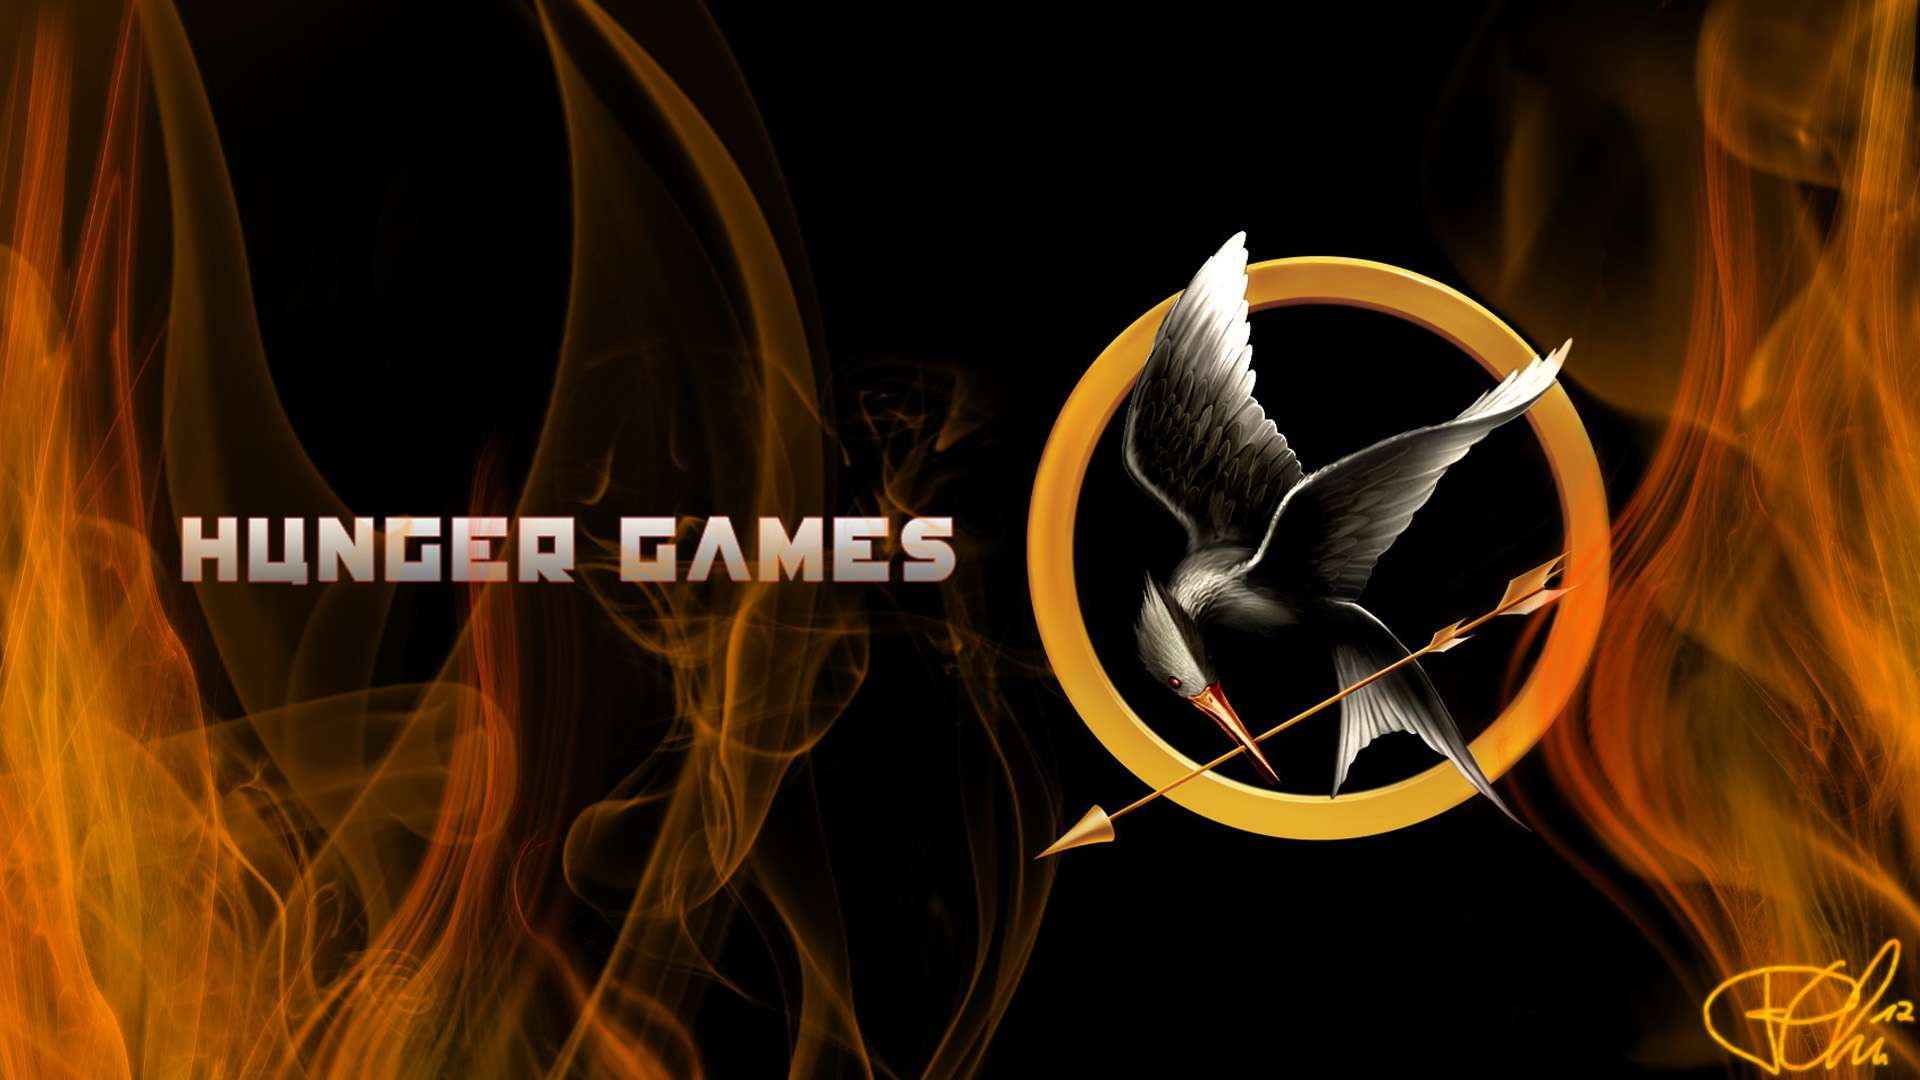 Hunger Games Fan Art HD Wallpaper FullHDWpp   Full HD Wallpapers 1920x1080